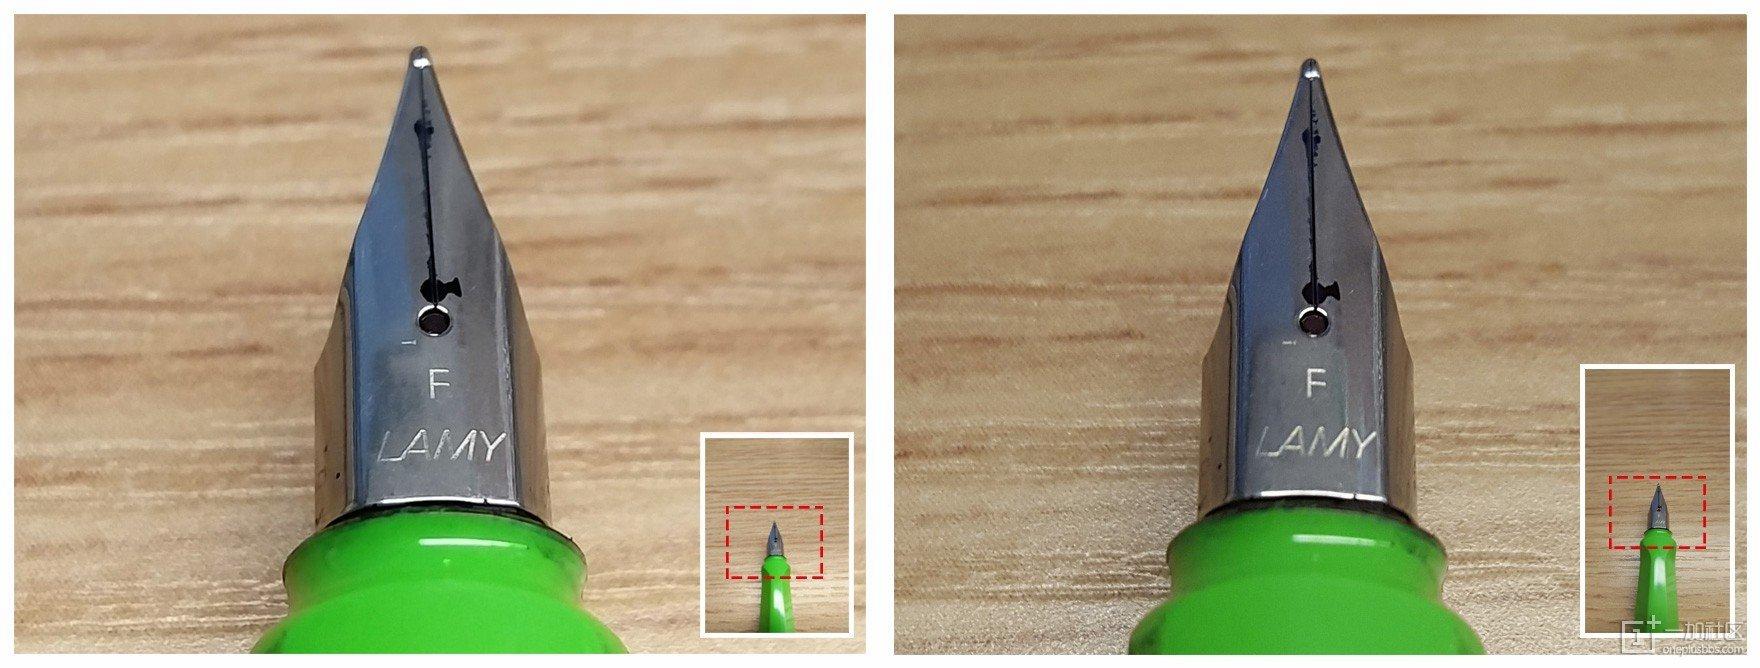 OnePlus-2-left-vs-Galaxy-S6-macro-and-iPhone-6-night-shots-samples (2)